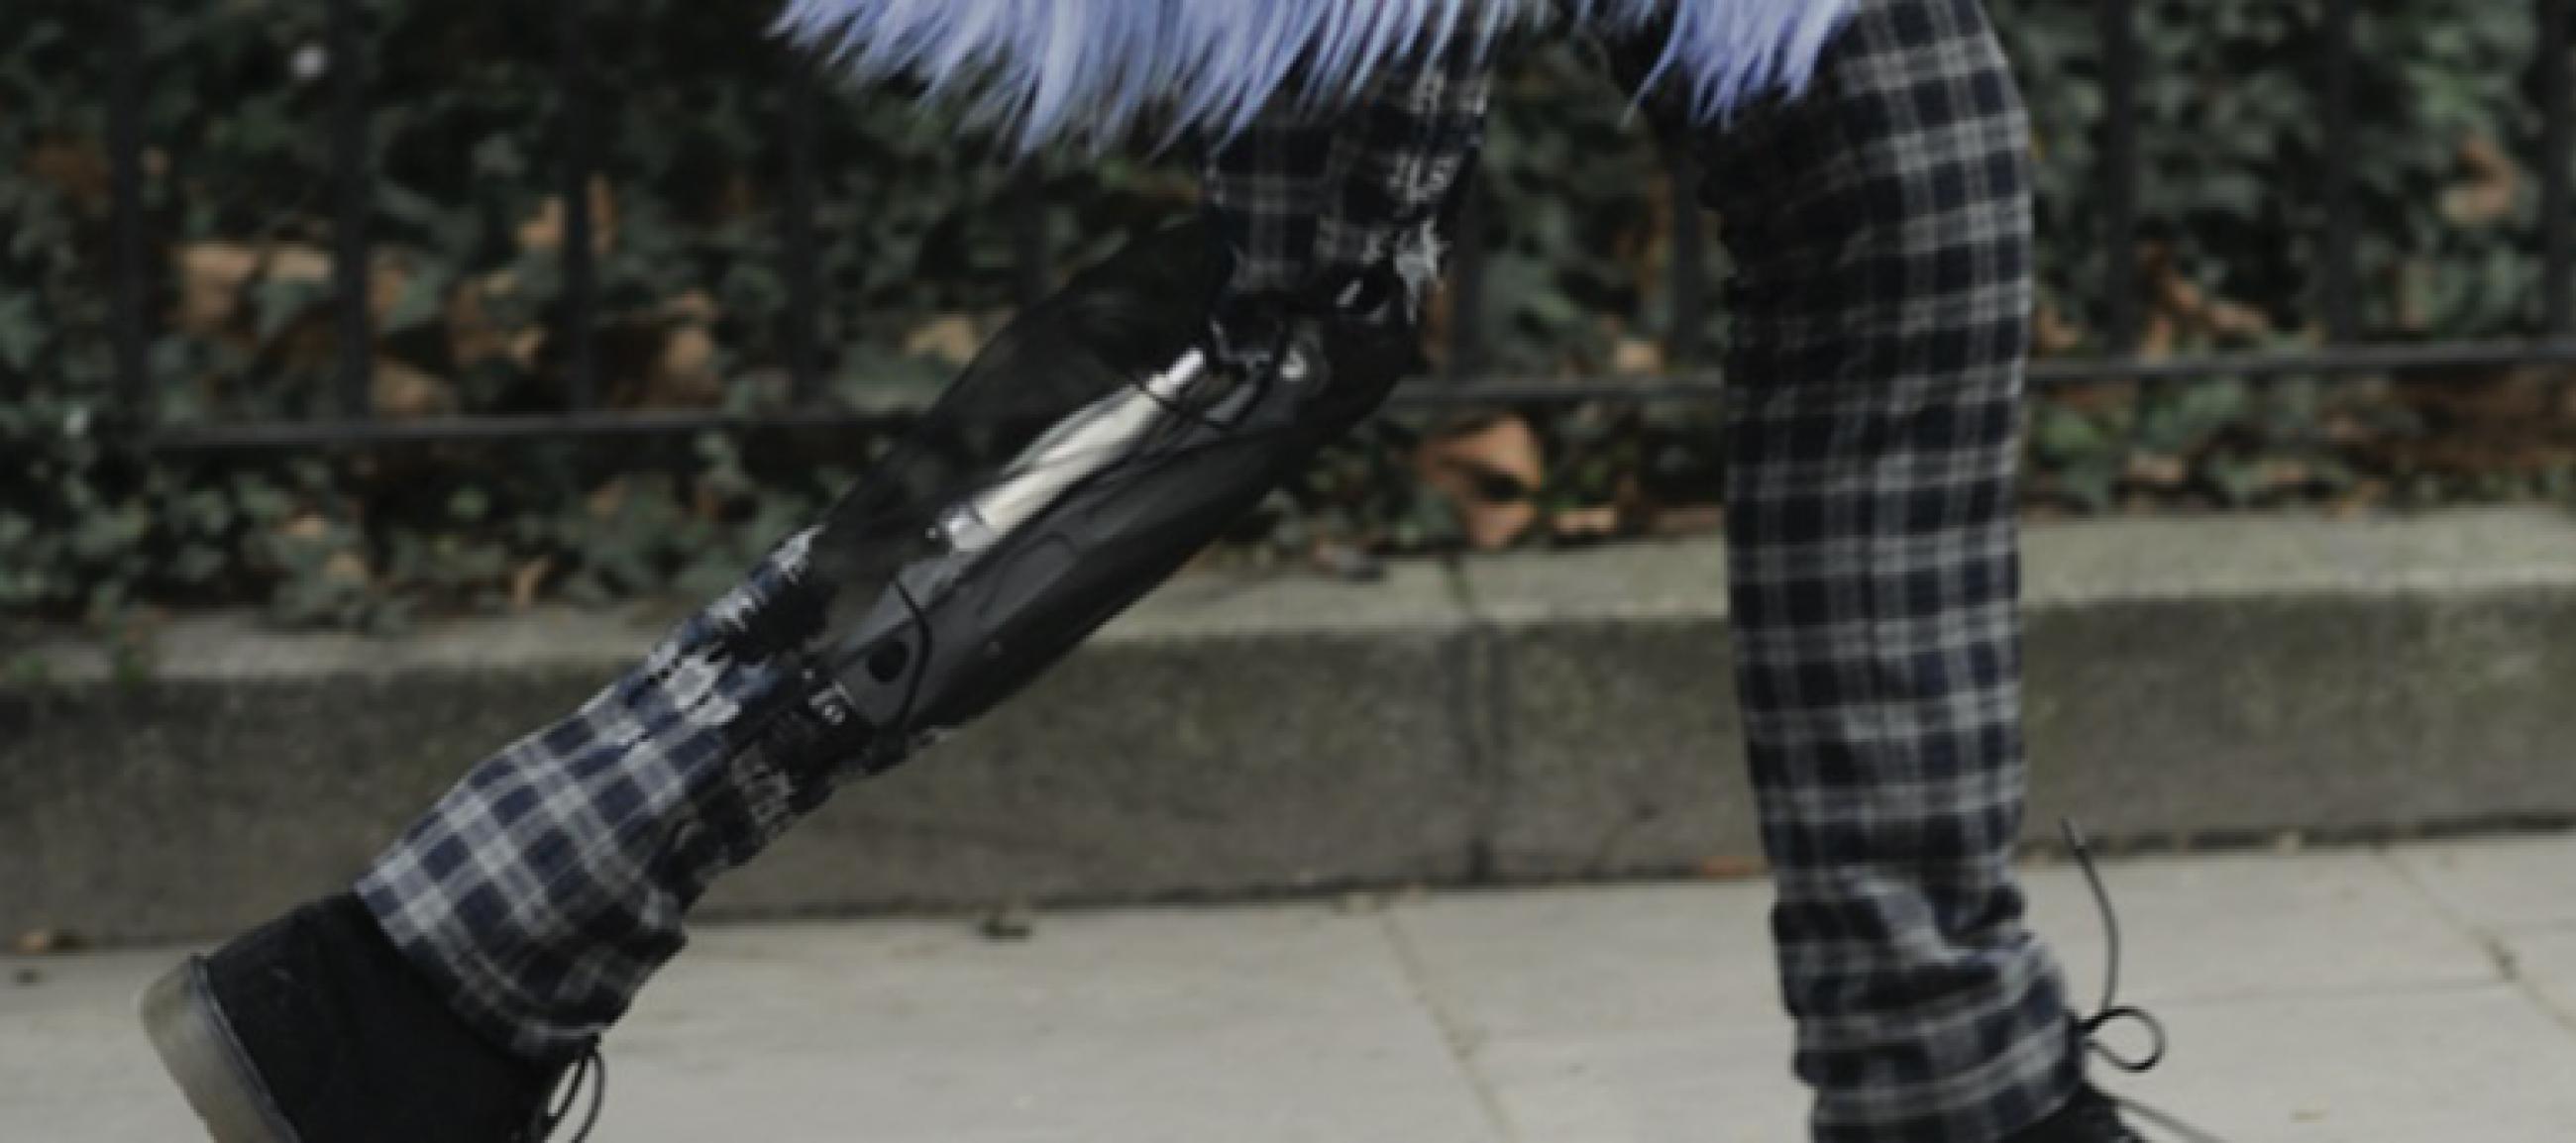 VGK Very Good Knee Prothesenträgerin